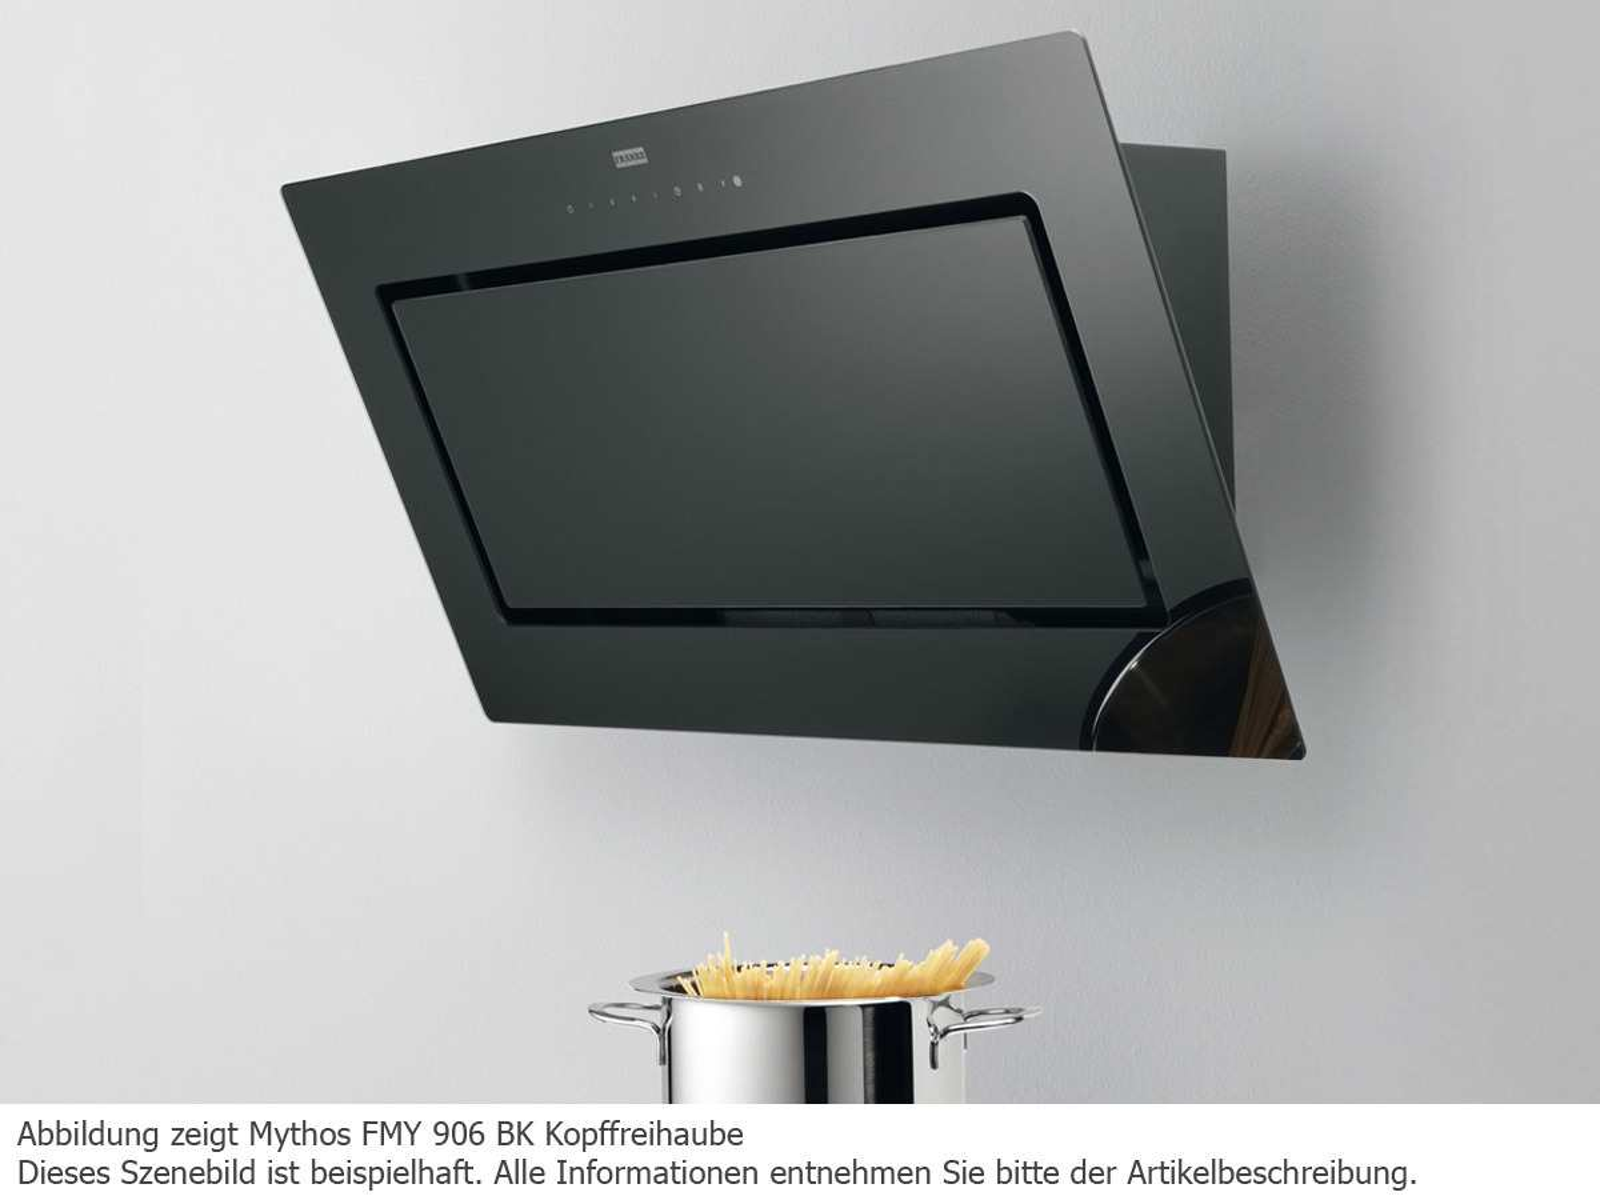 franke mythos fmy 806 wh kopffreihaube wei. Black Bedroom Furniture Sets. Home Design Ideas